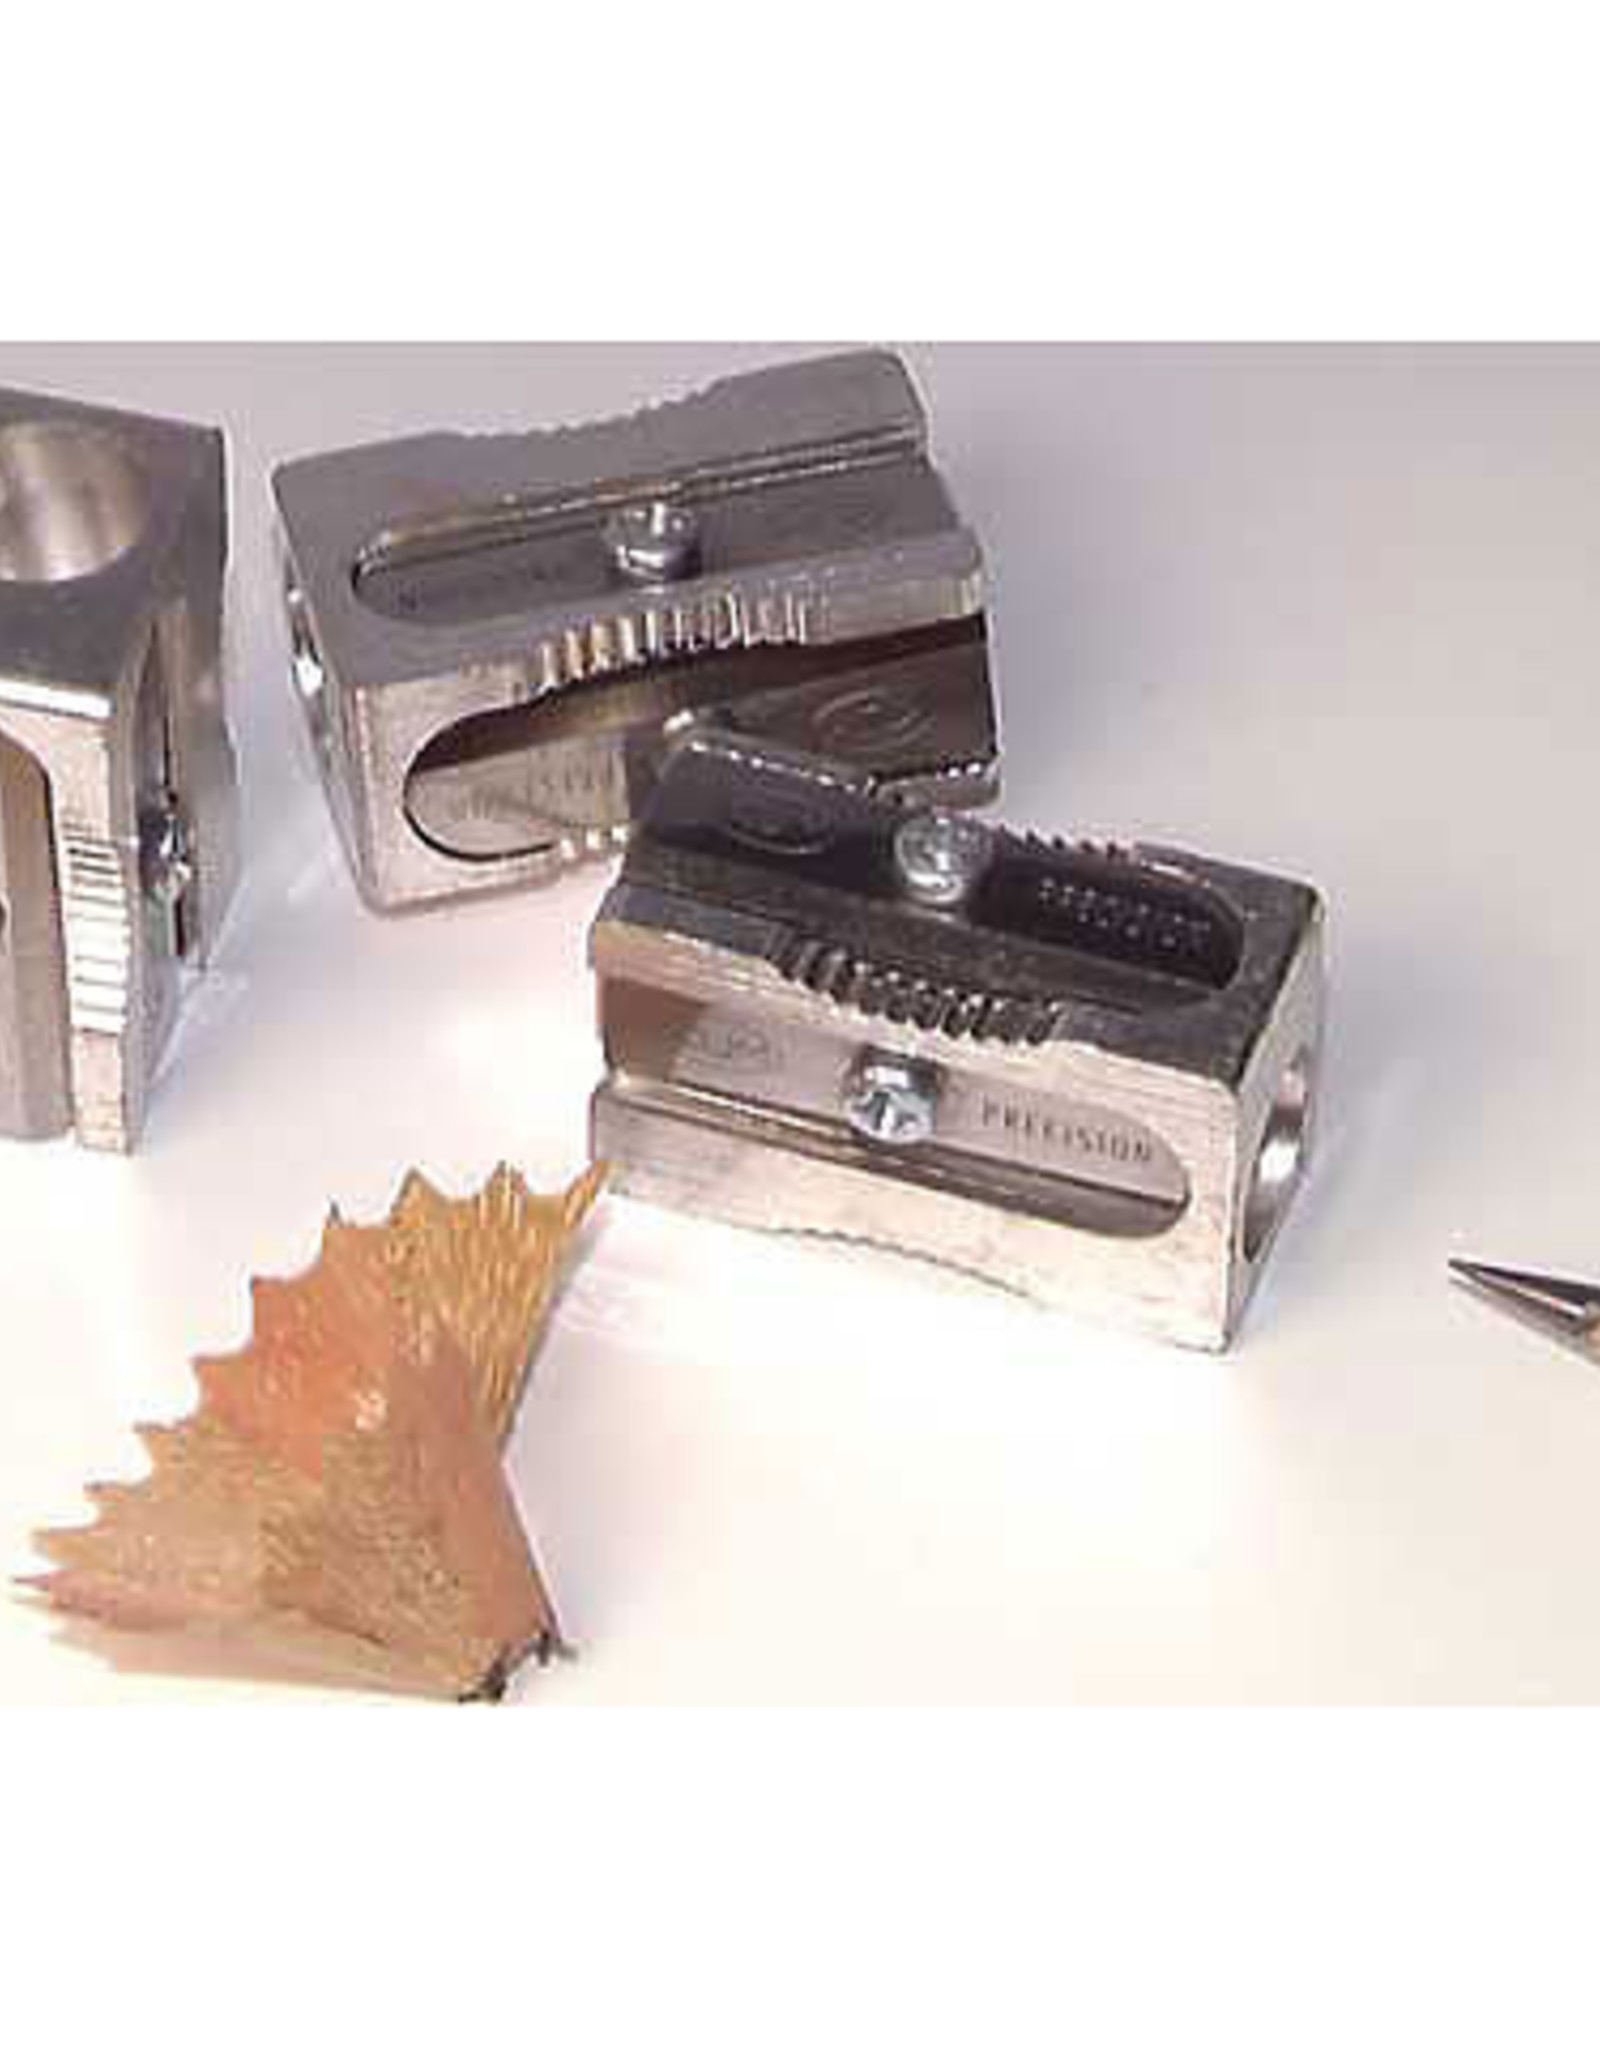 KUM Magnesium-Alloy Metal Rectangular Sharpener with Spare Blades